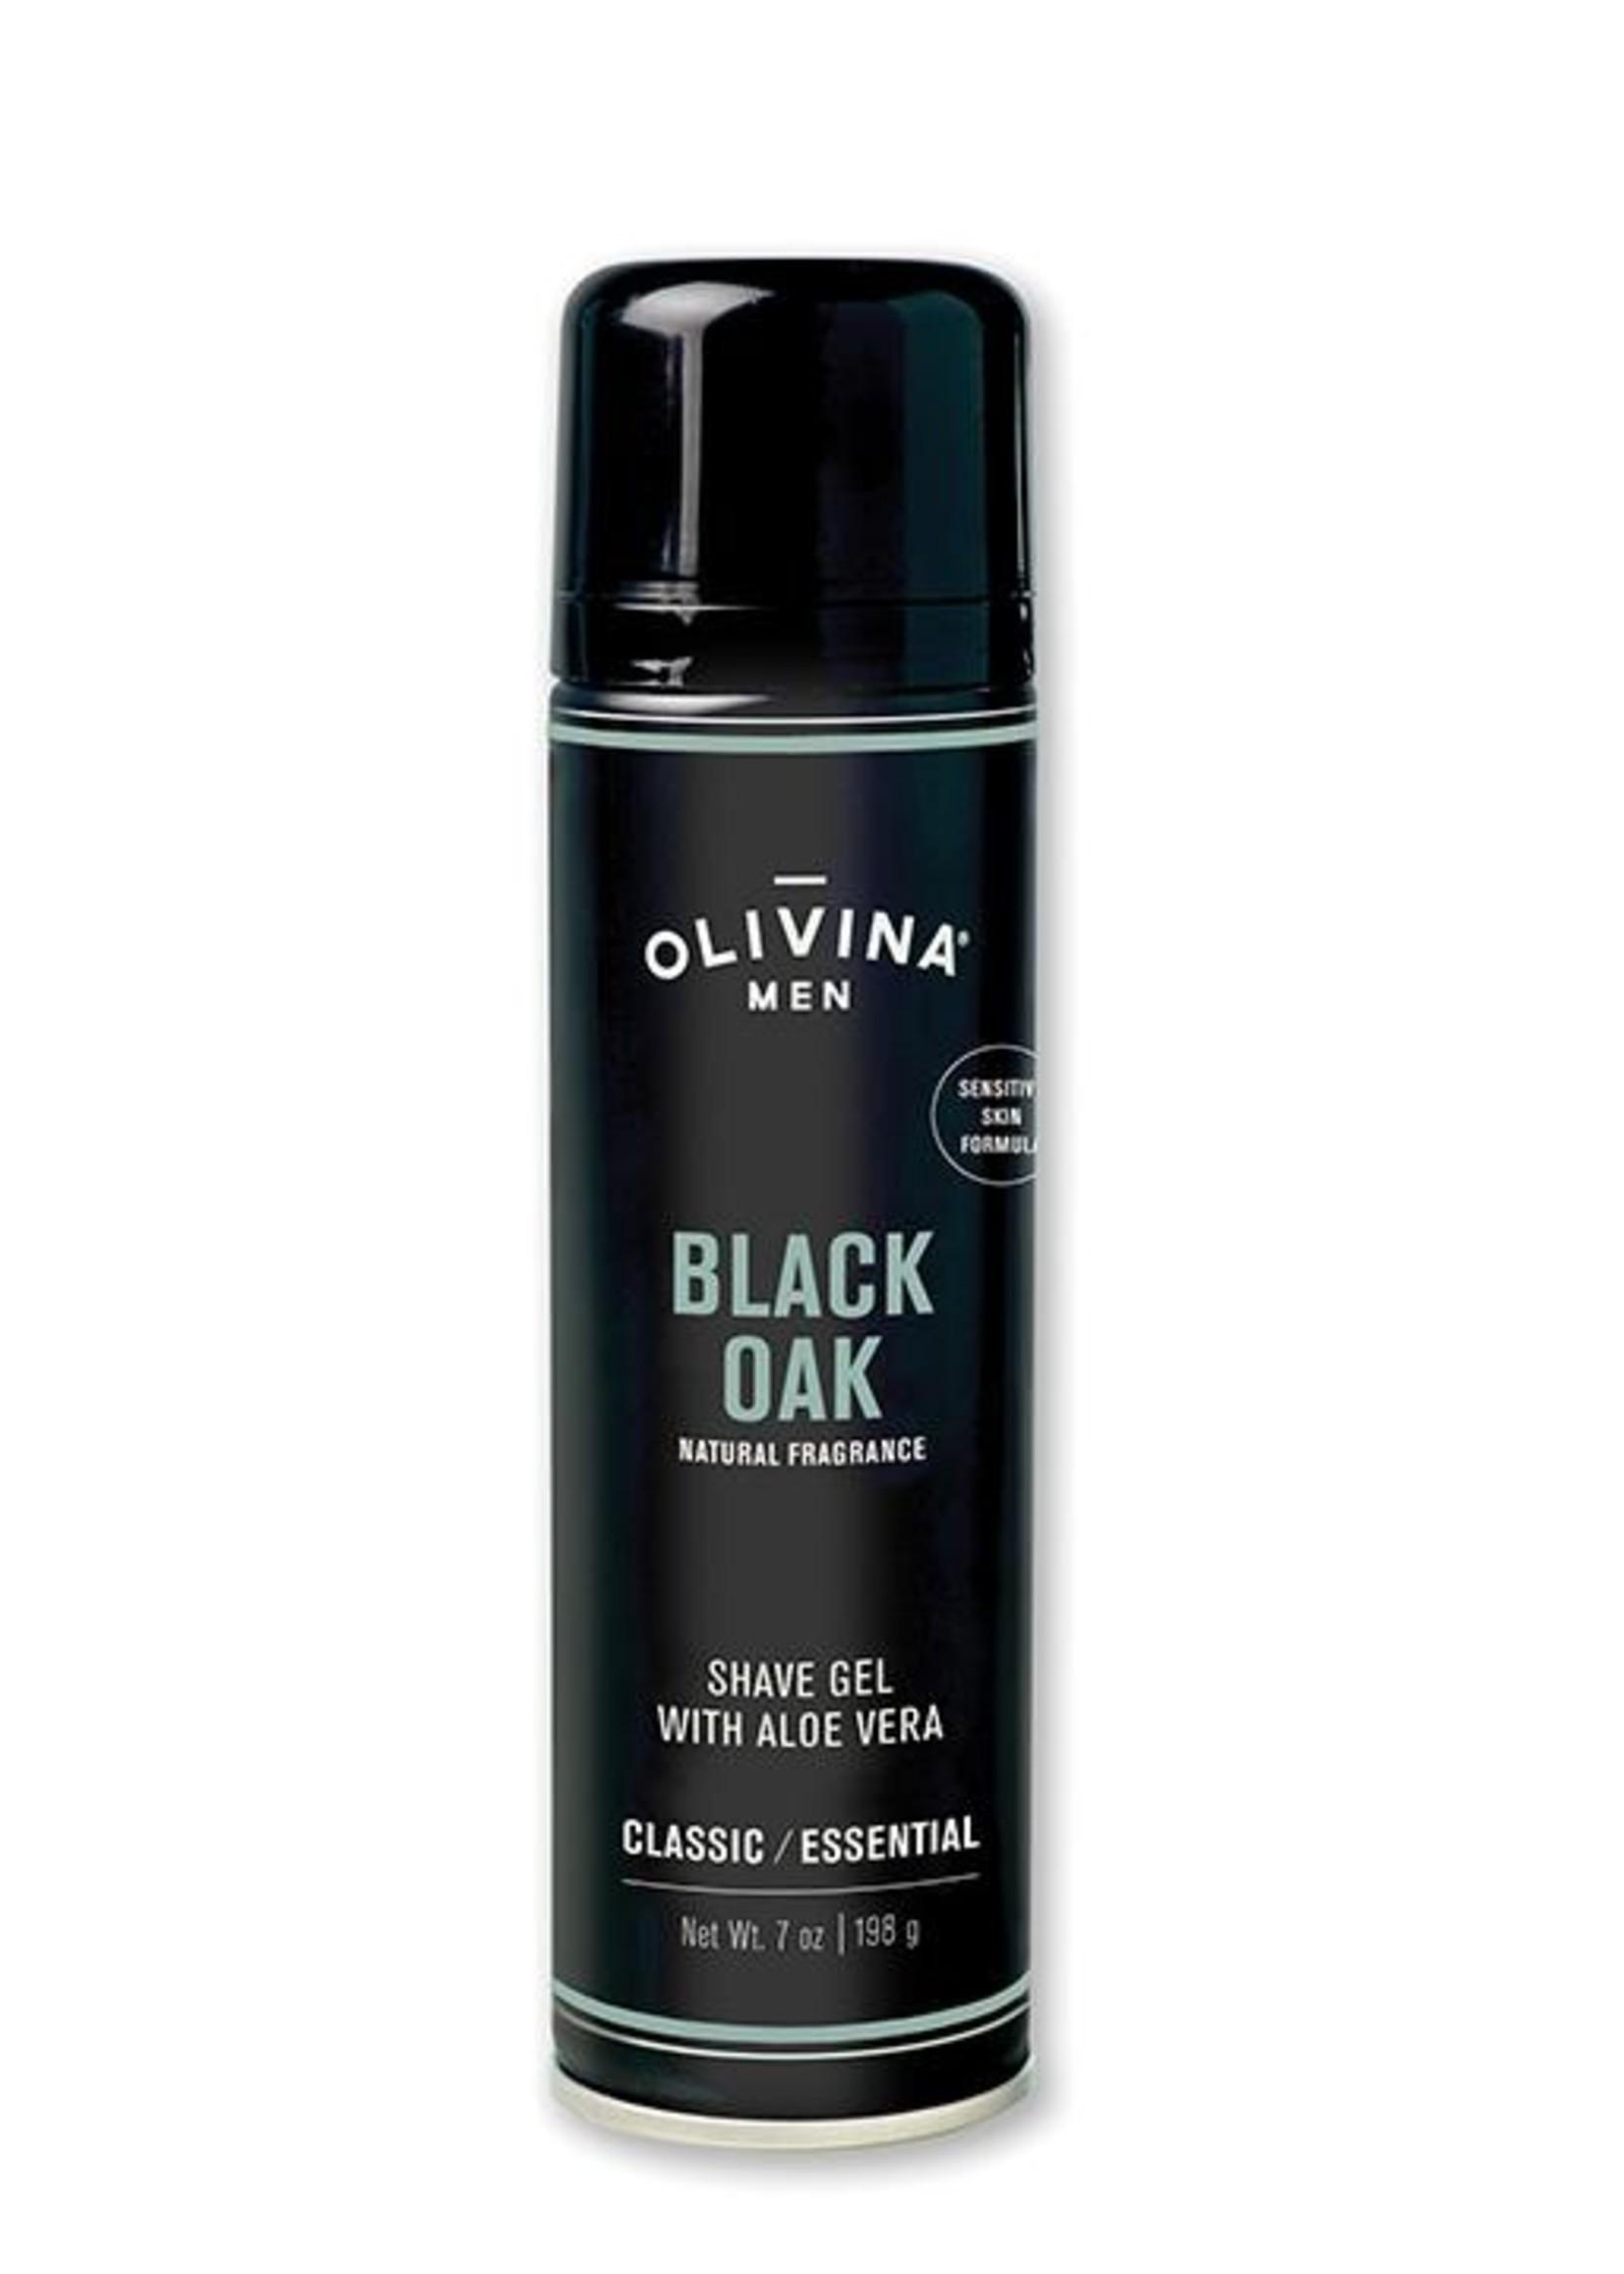 Olivina Olvina Shave Gel